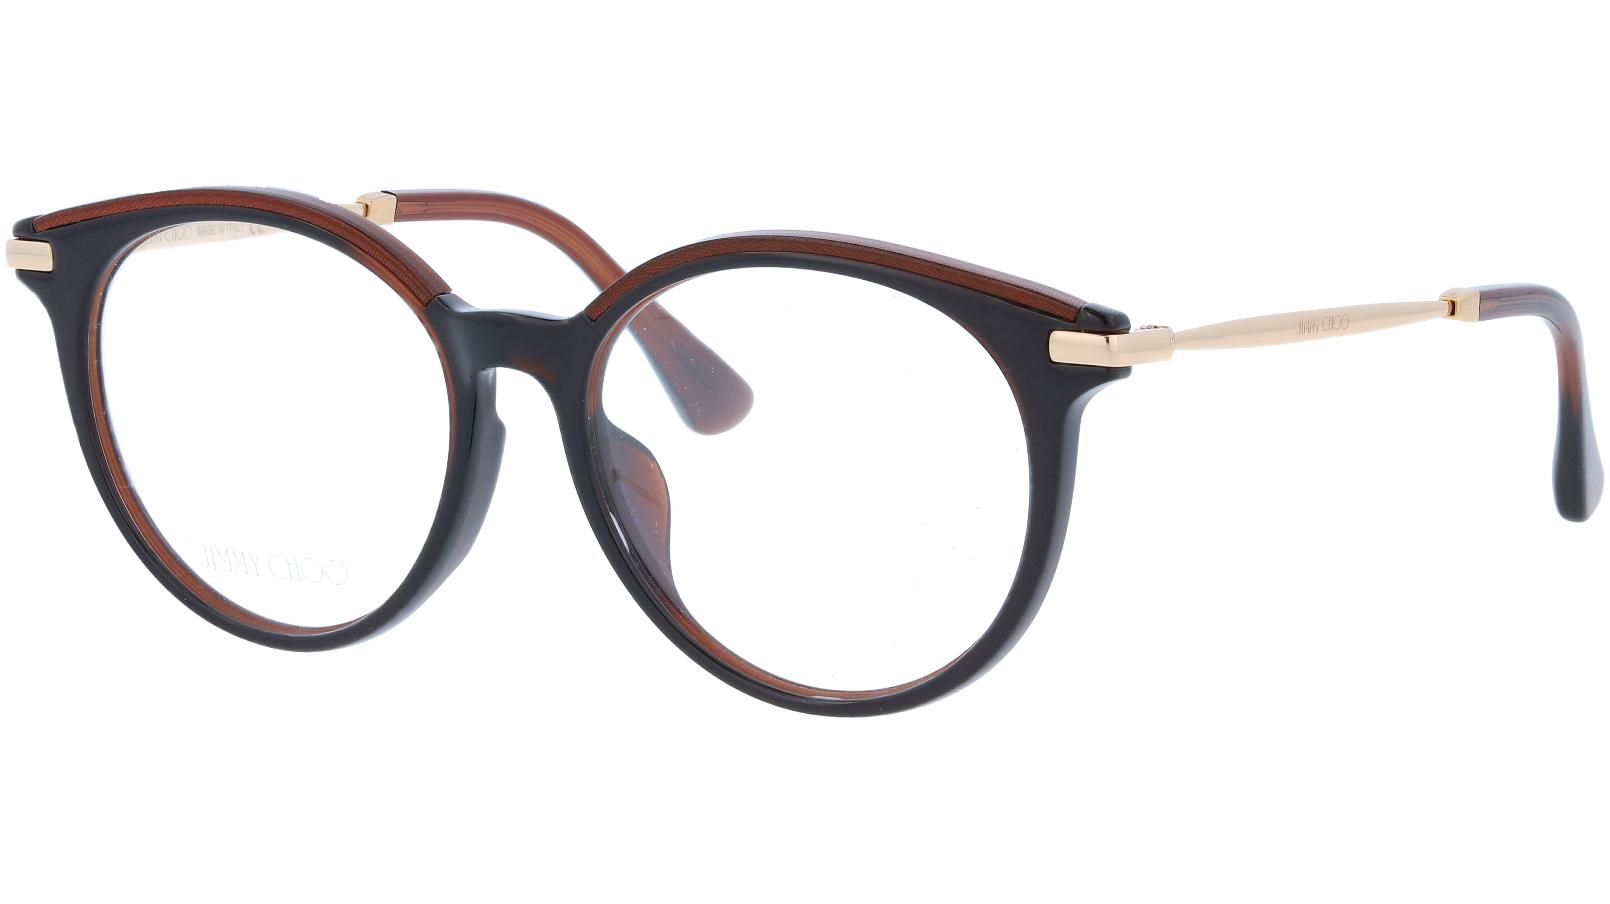 Jimmy Choo JC254/F 2PI 51 Brown  Glasses